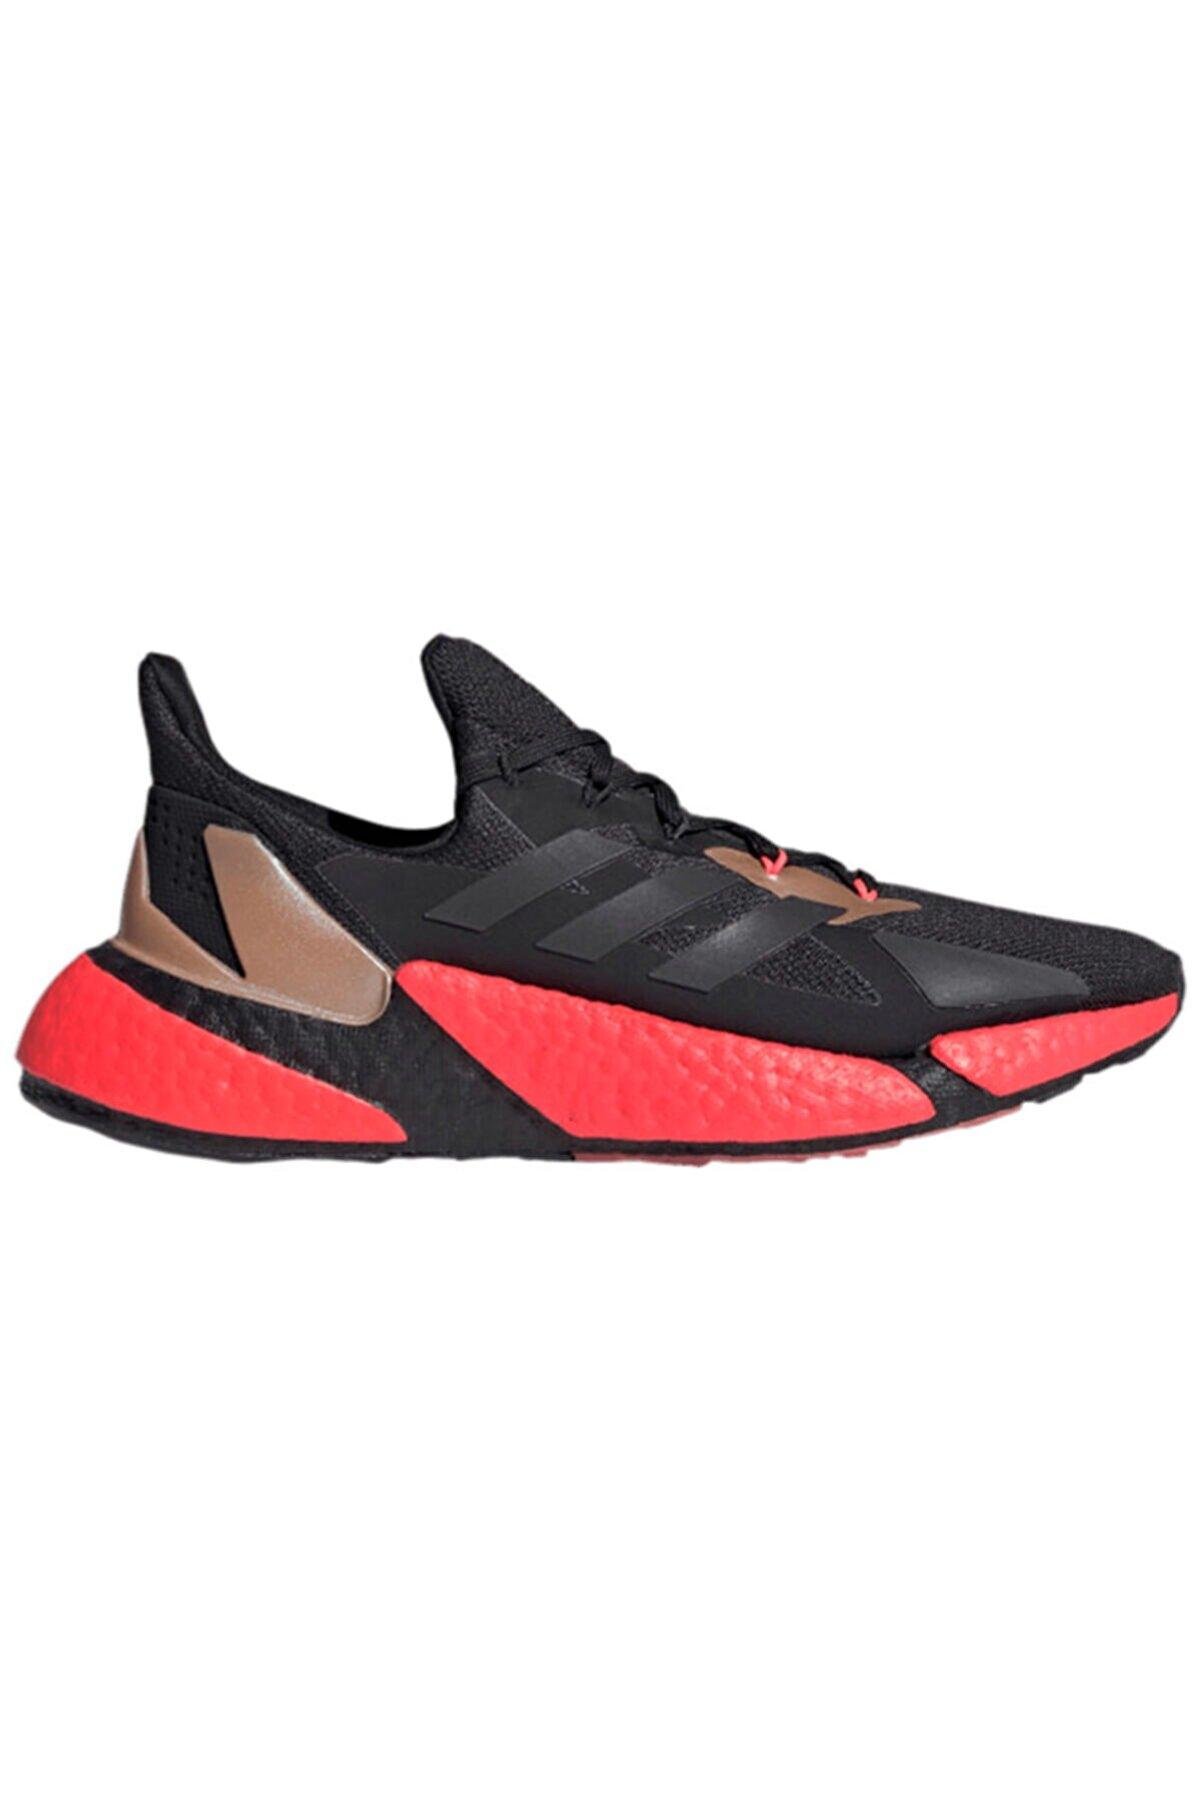 adidas Erkek Siyah Antrenman Ayakkabı